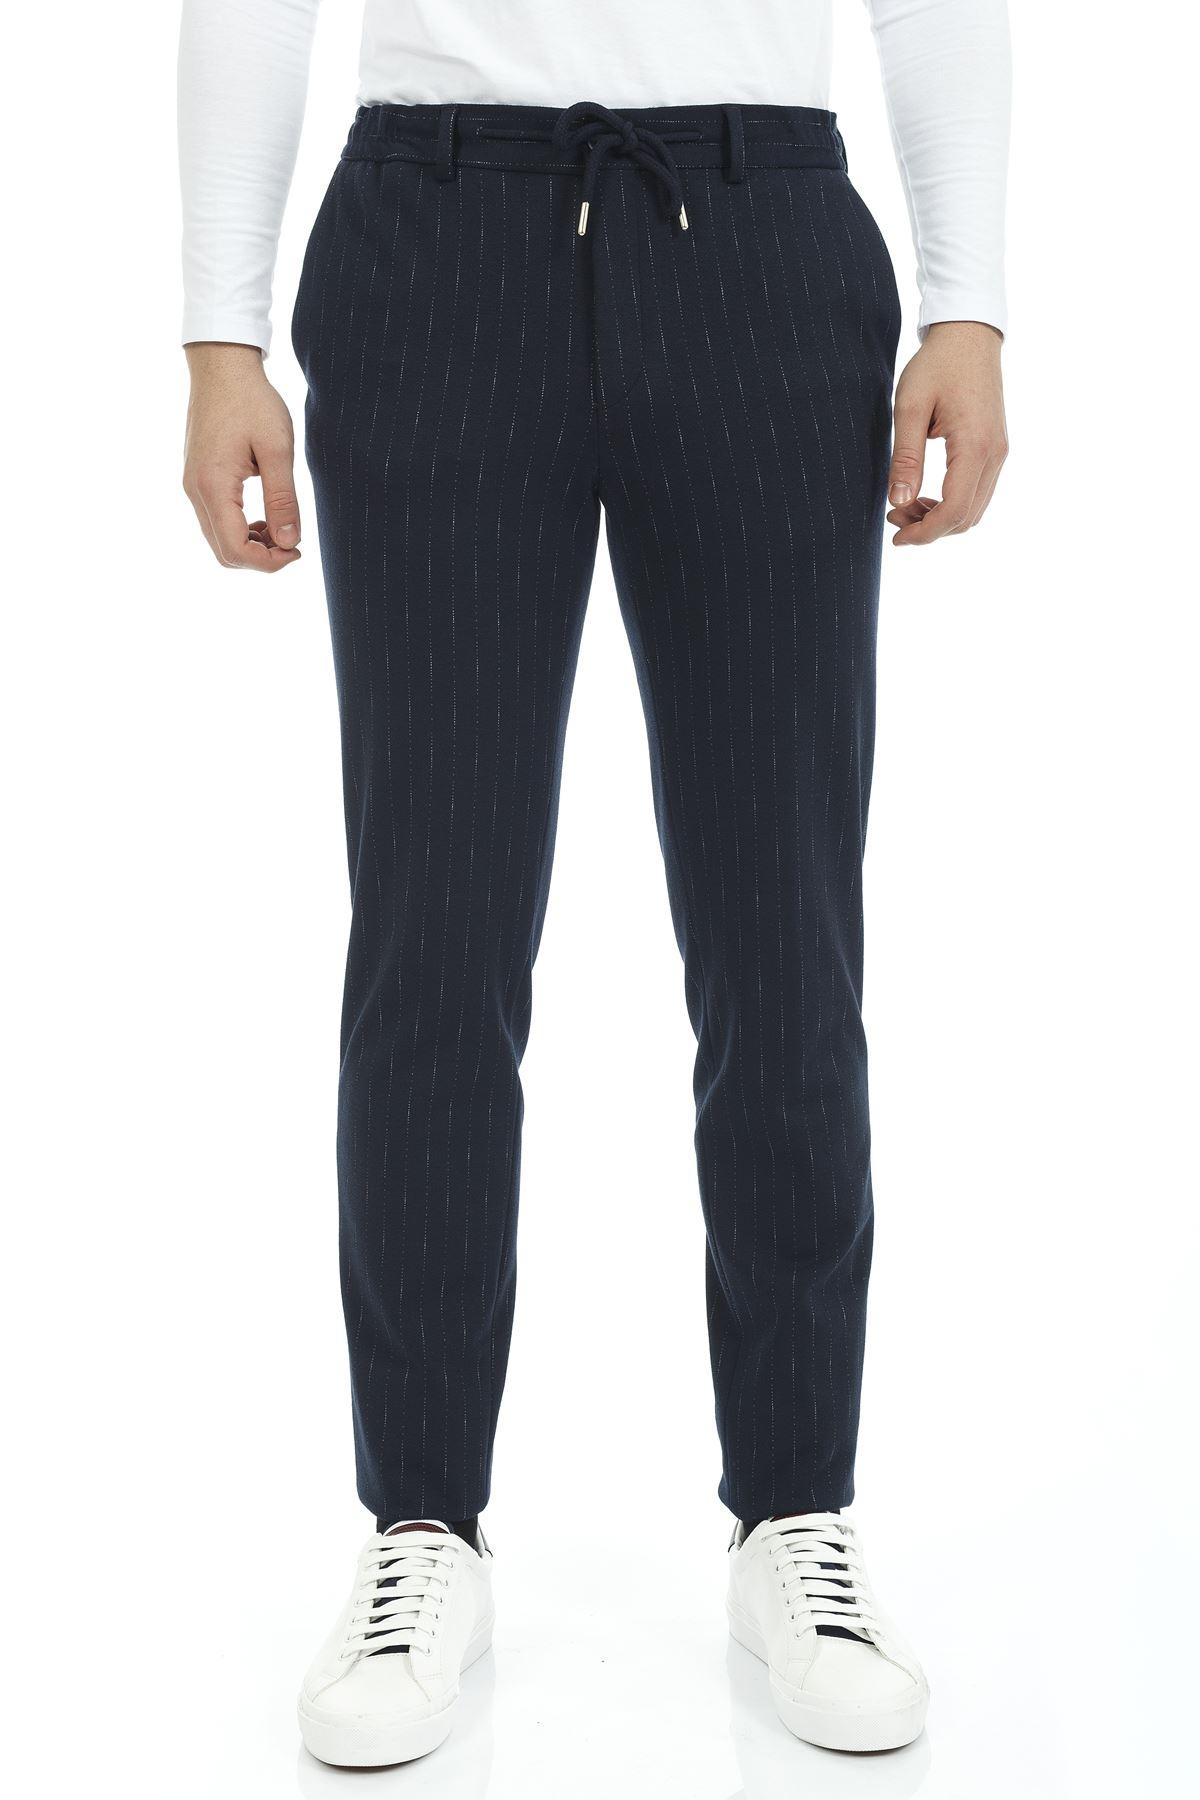 Lacivert Beyaz Çizgili Bağcıklı Süper Slim Jogger Pantolon